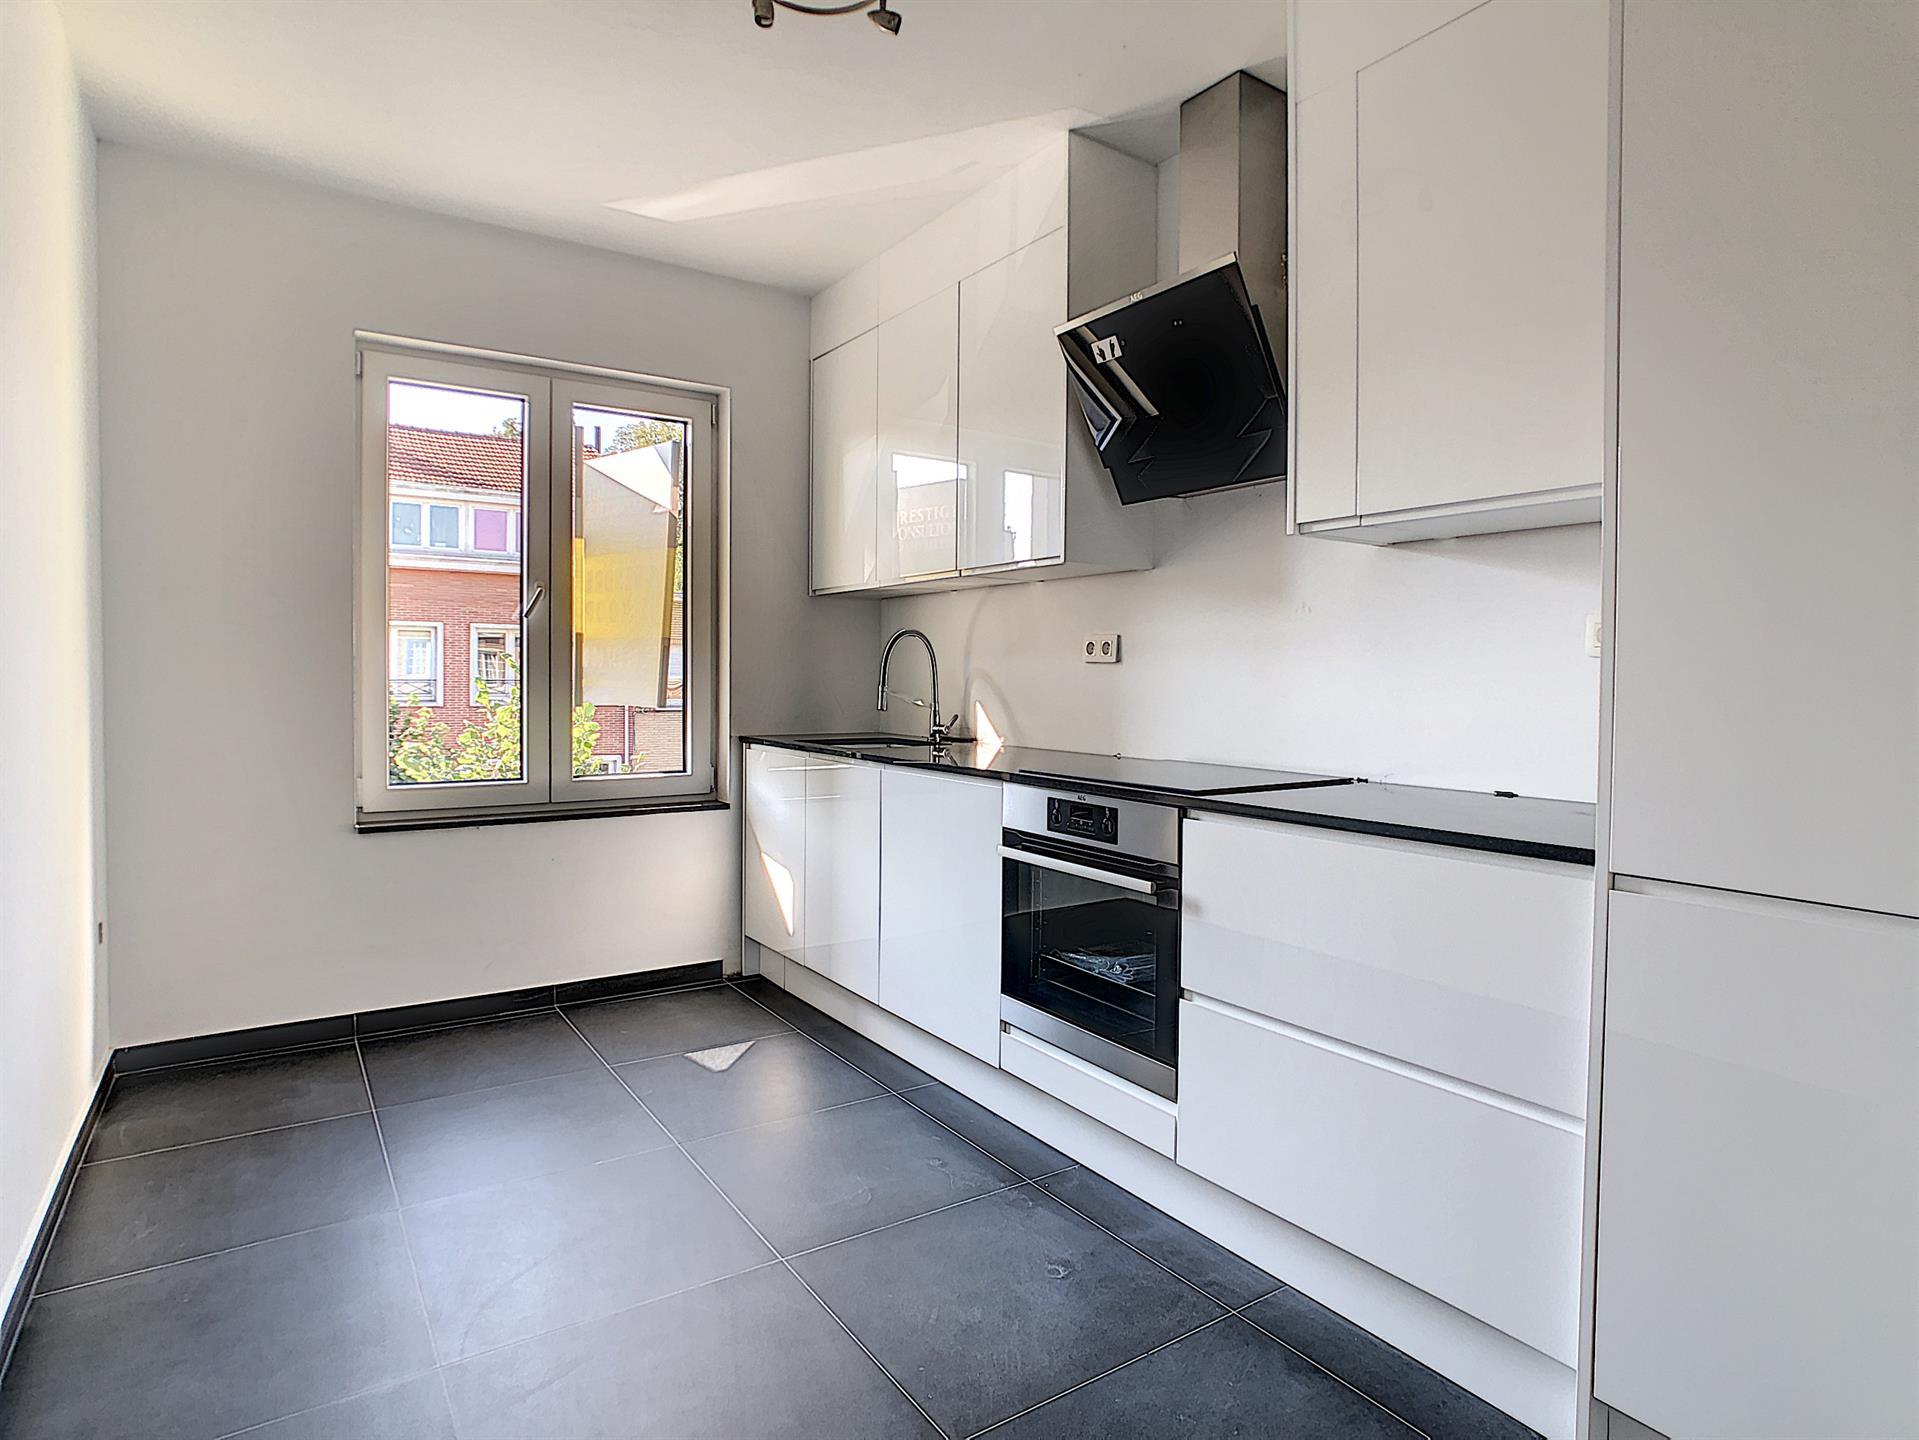 Appartement - Anderlecht - #4252385-27